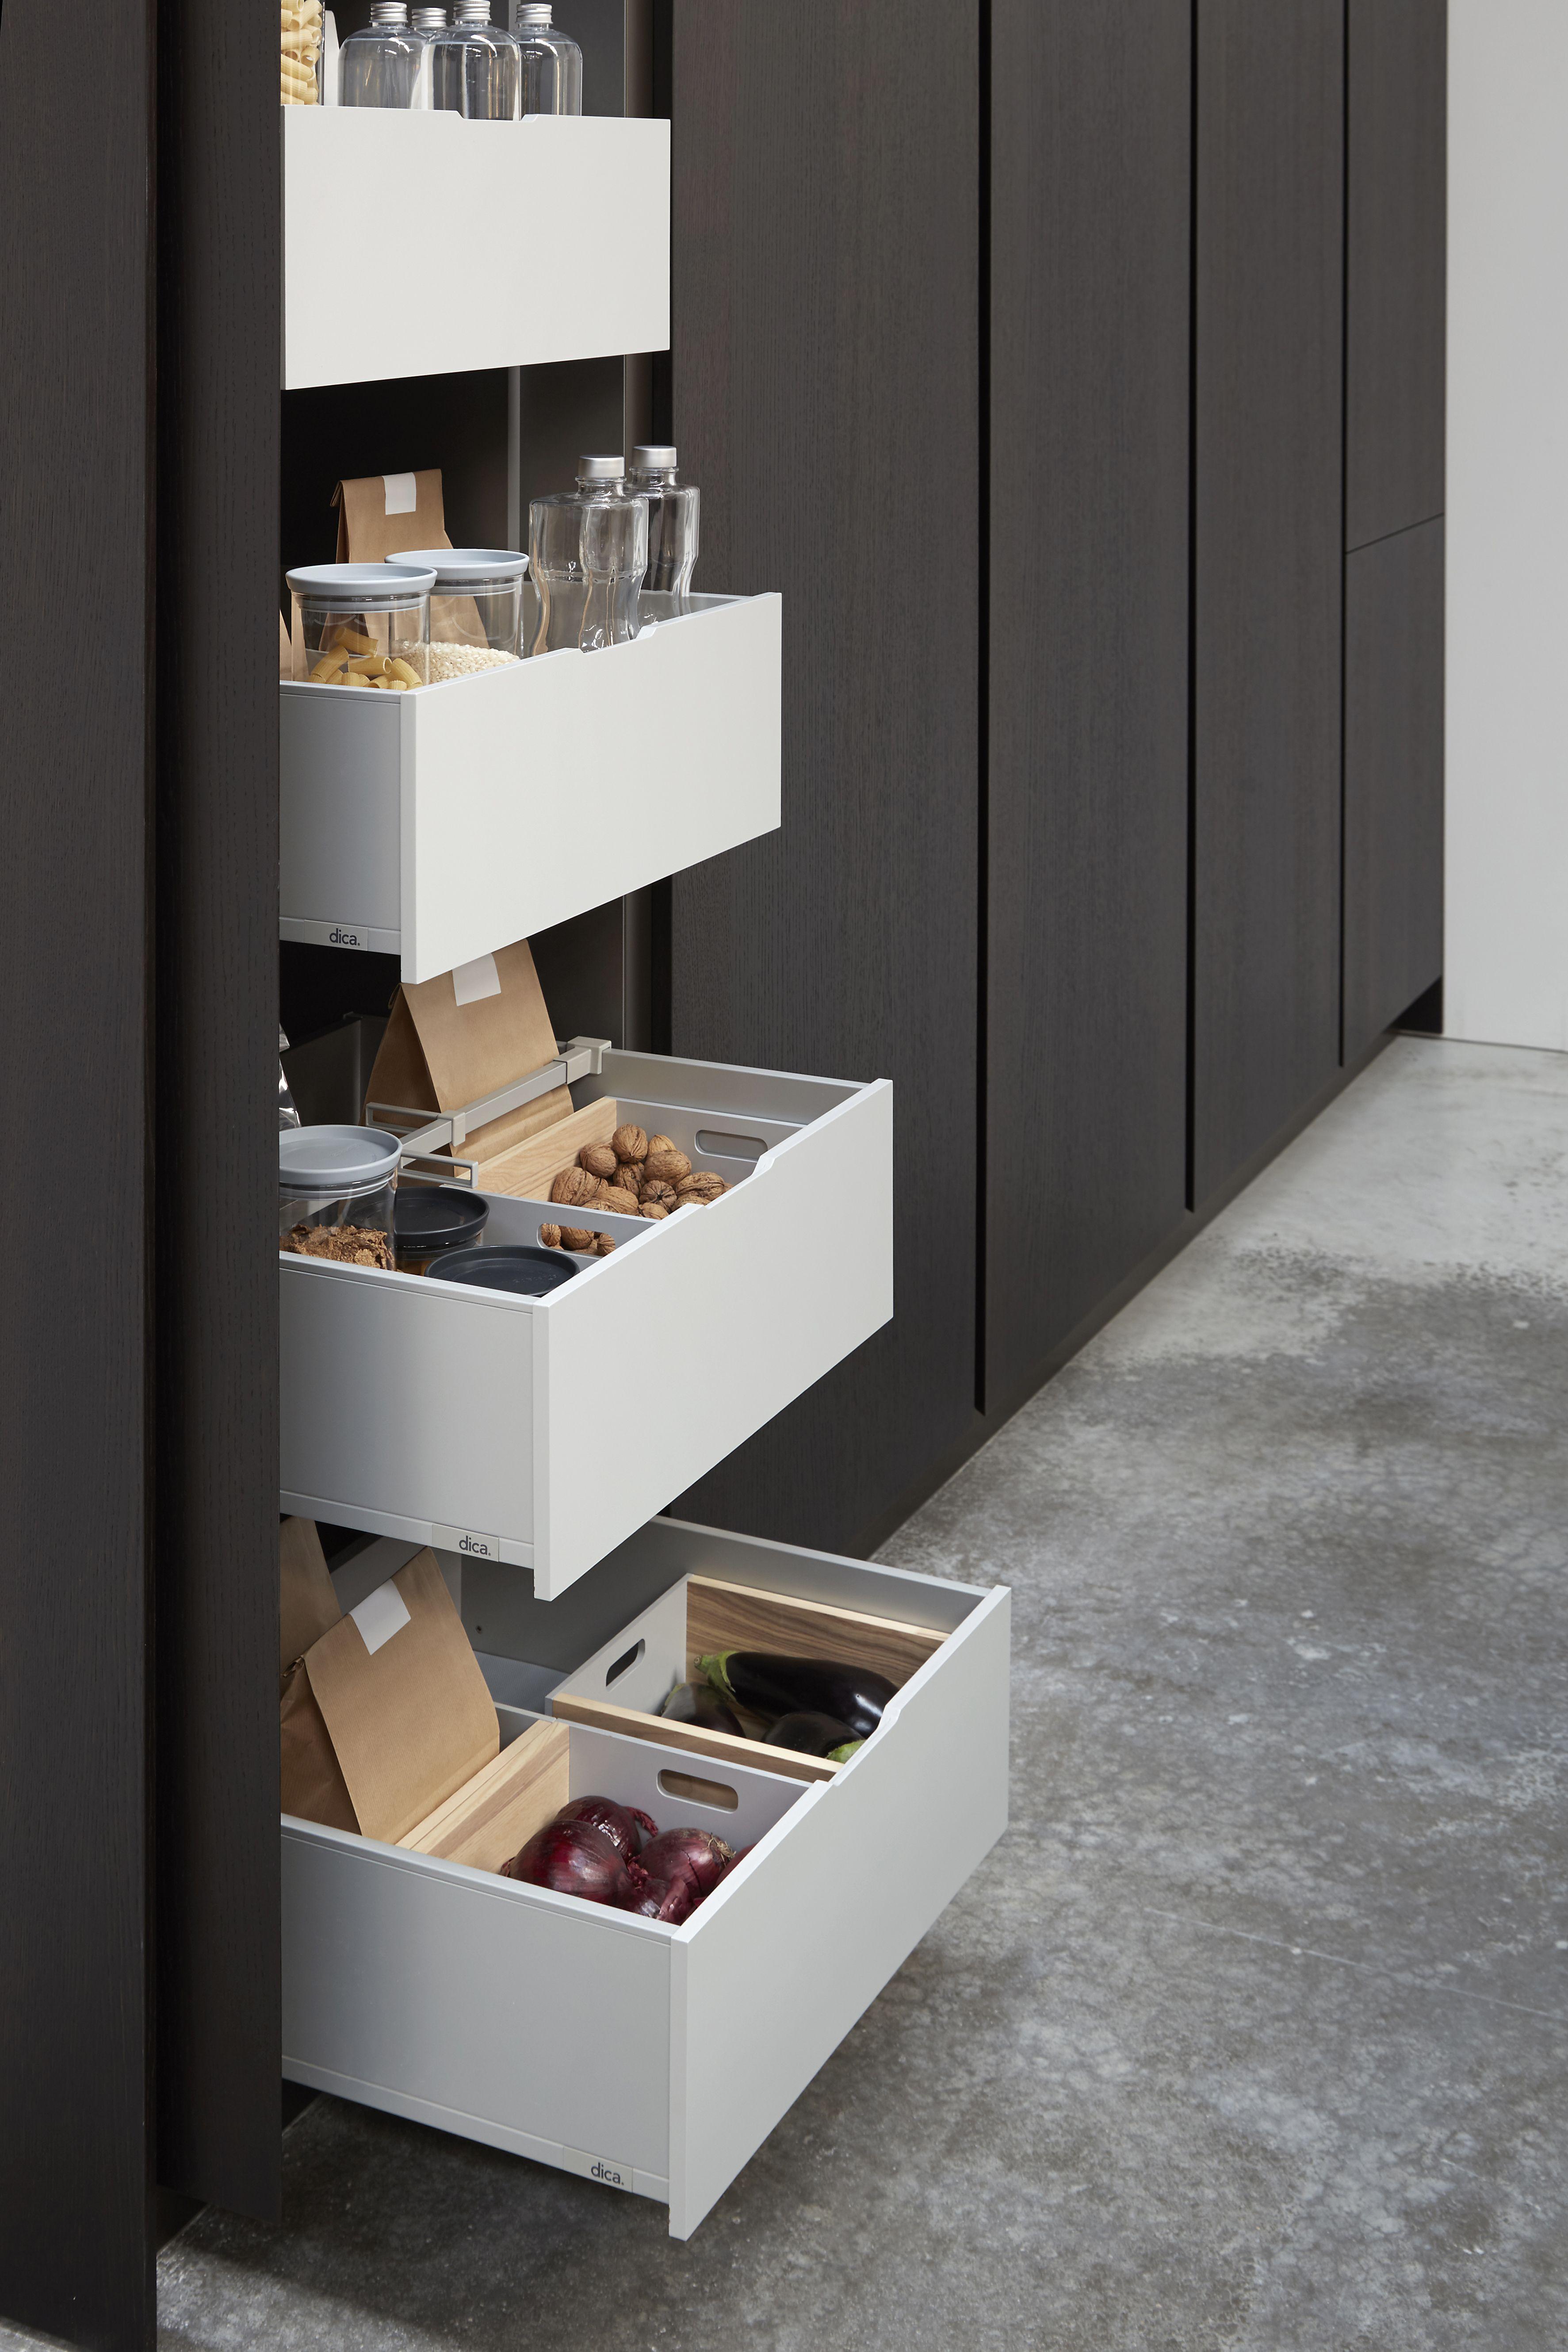 Muebles de cocina serie soho cat logo de estudio de for Catalogo muebles de cocina